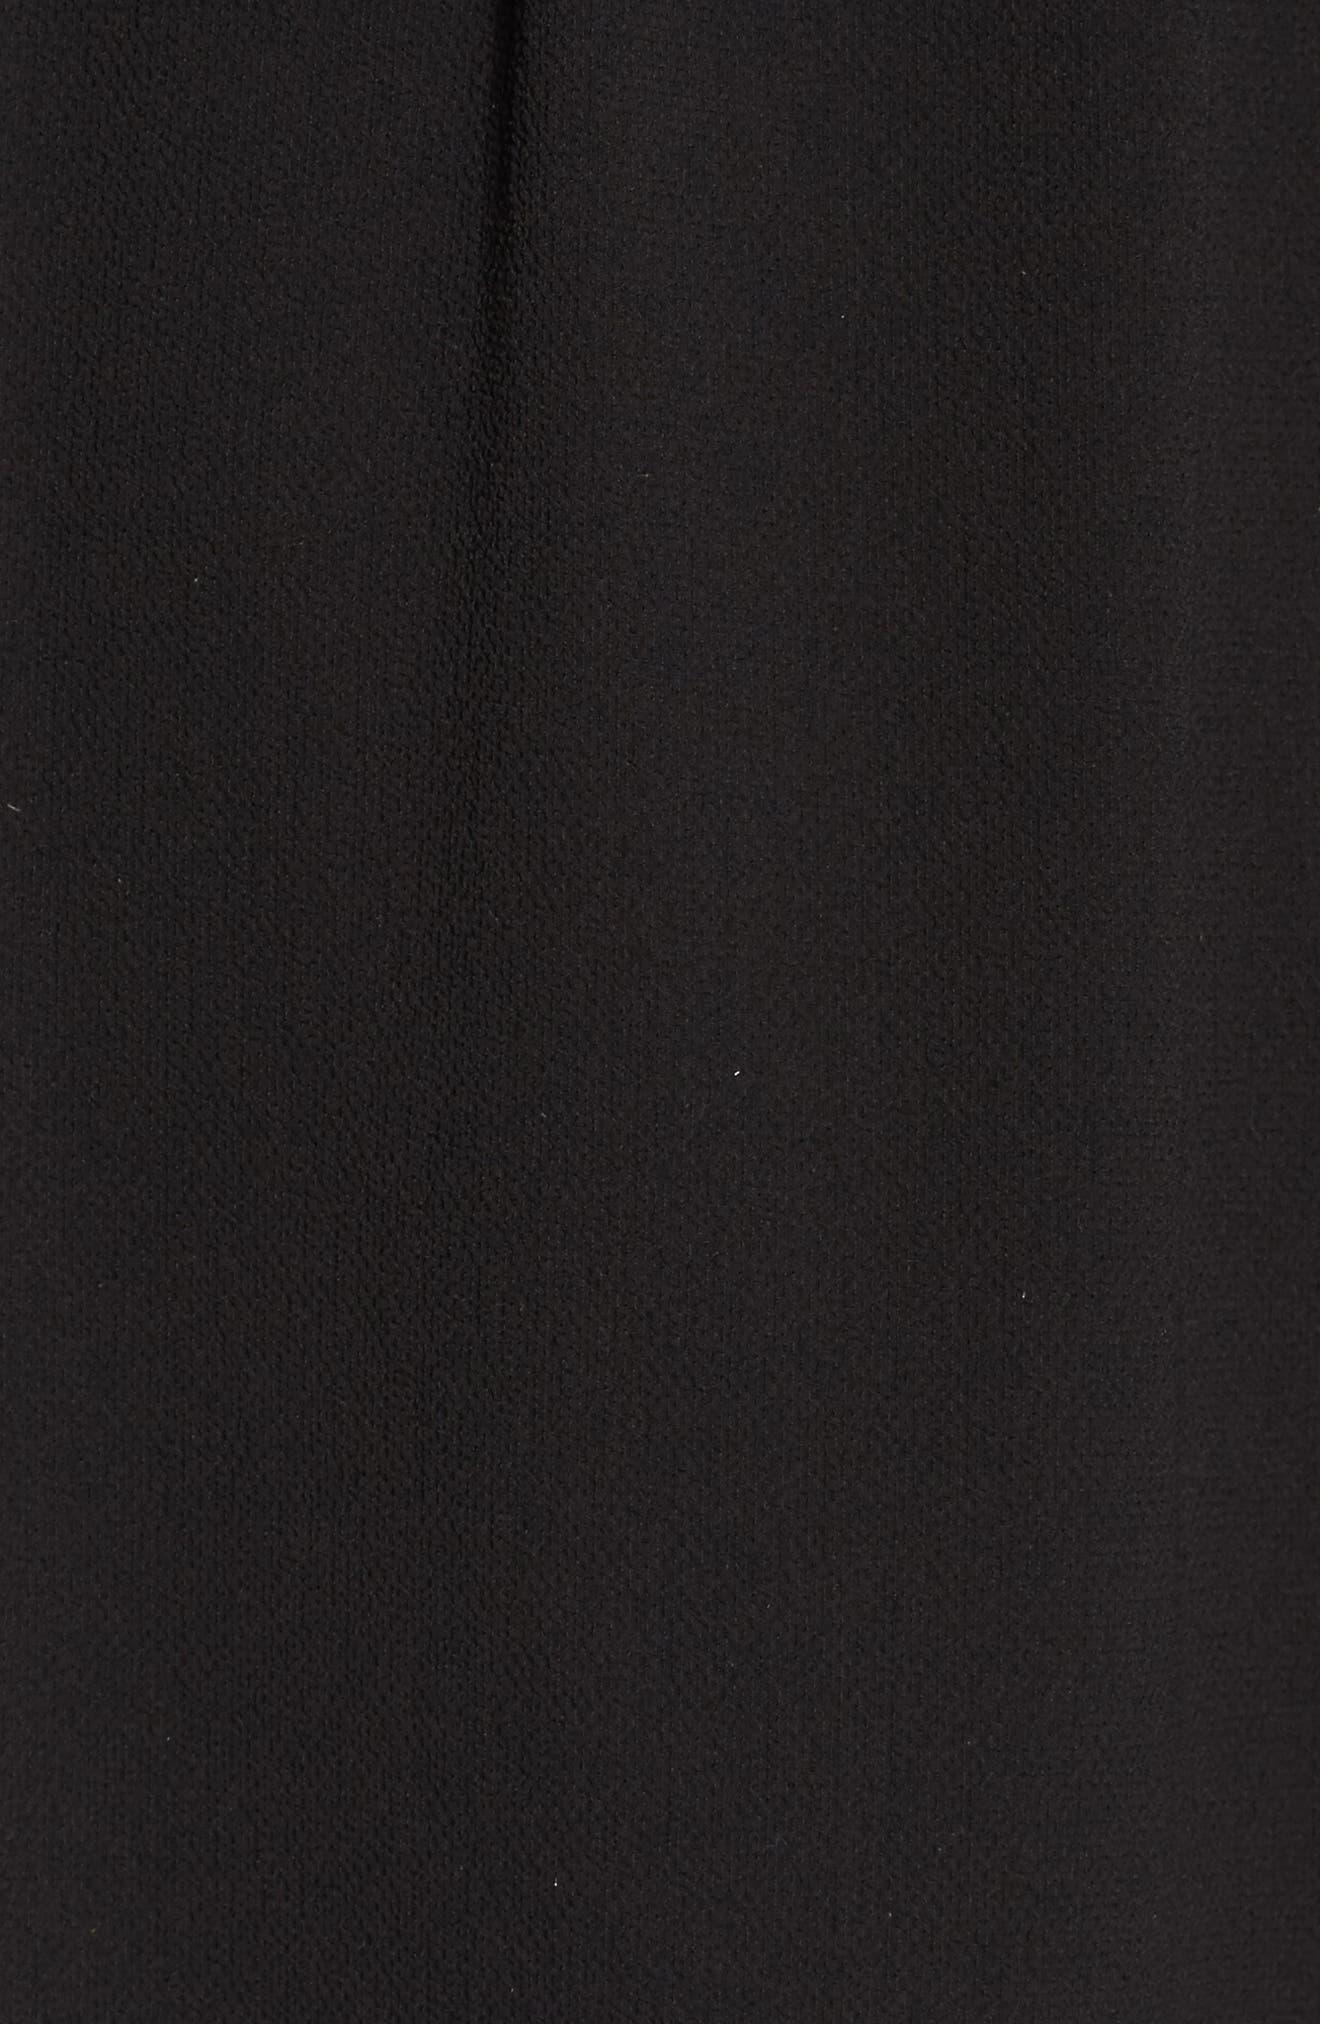 Mock Neck Shift Dress,                             Alternate thumbnail 5, color,                             Black